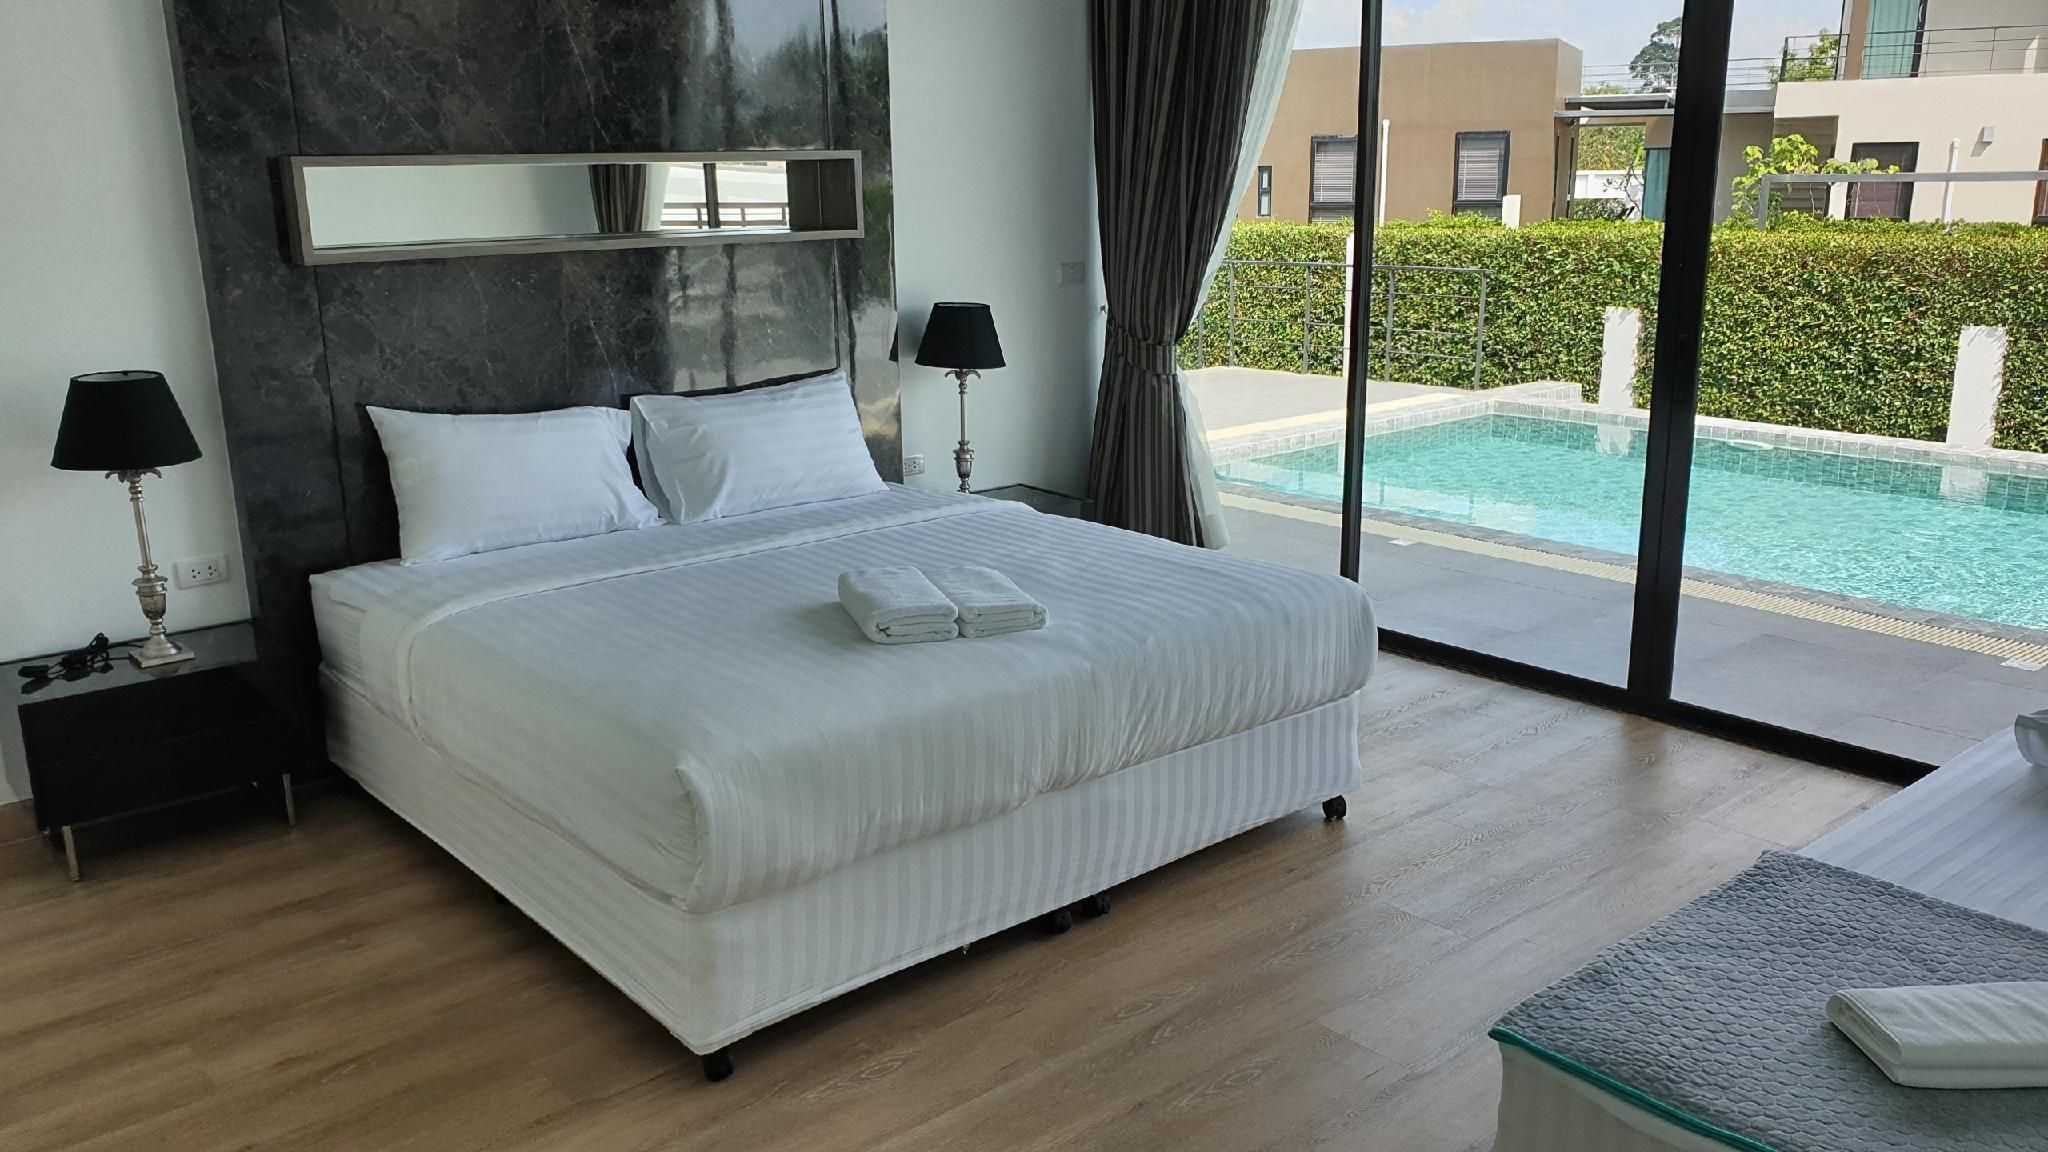 Villa Ozone Pattaya No.37(3Bed,4Bath,Private Pool) วิลลา 3 ห้องนอน 4 ห้องน้ำส่วนตัว ขนาด 445 ตร.ม. – บางสเหร่